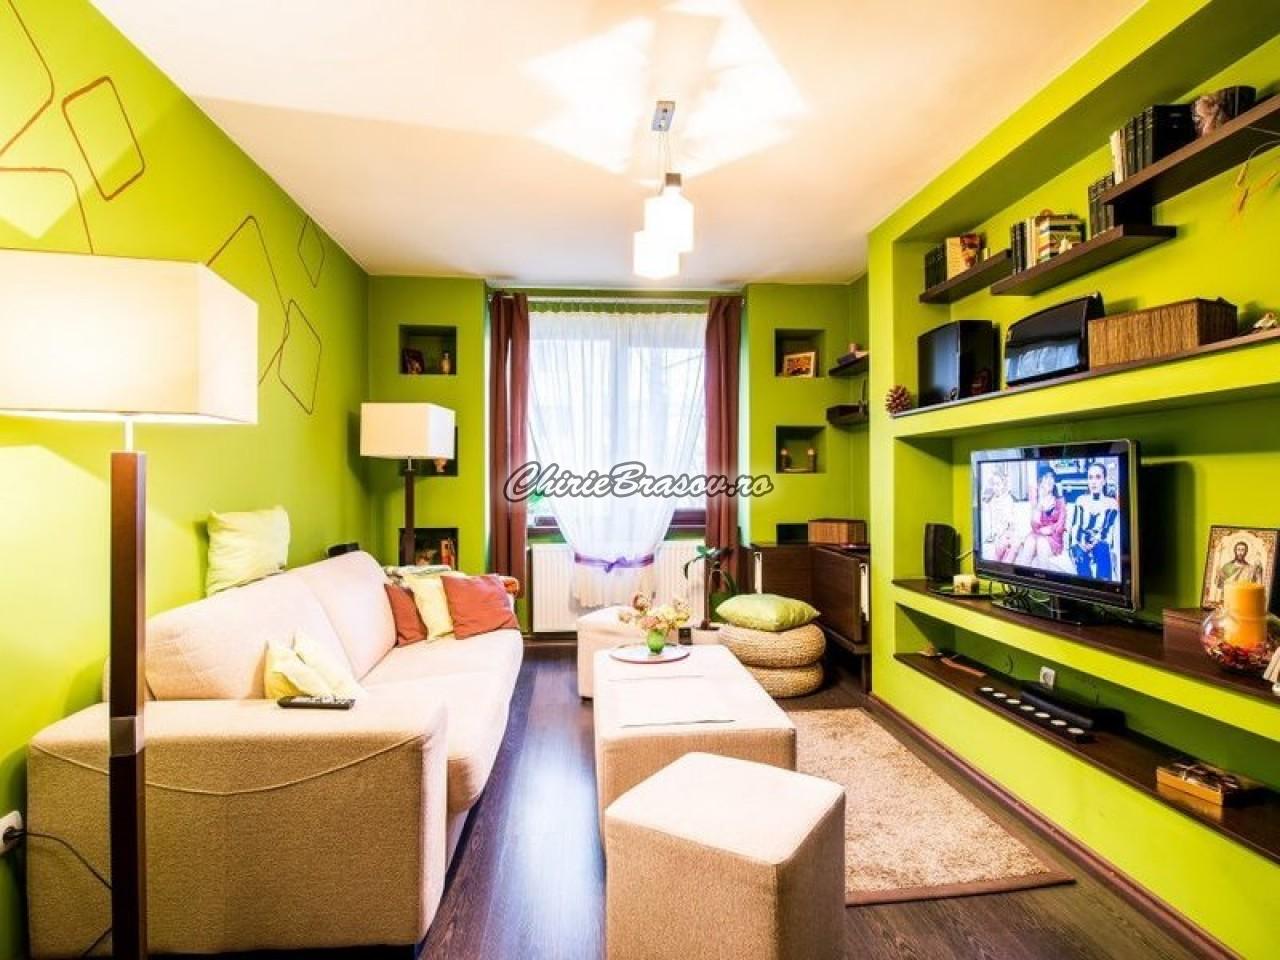 Inchiriere apartament 2 camere Brasov , Central - Grivitei-353-5